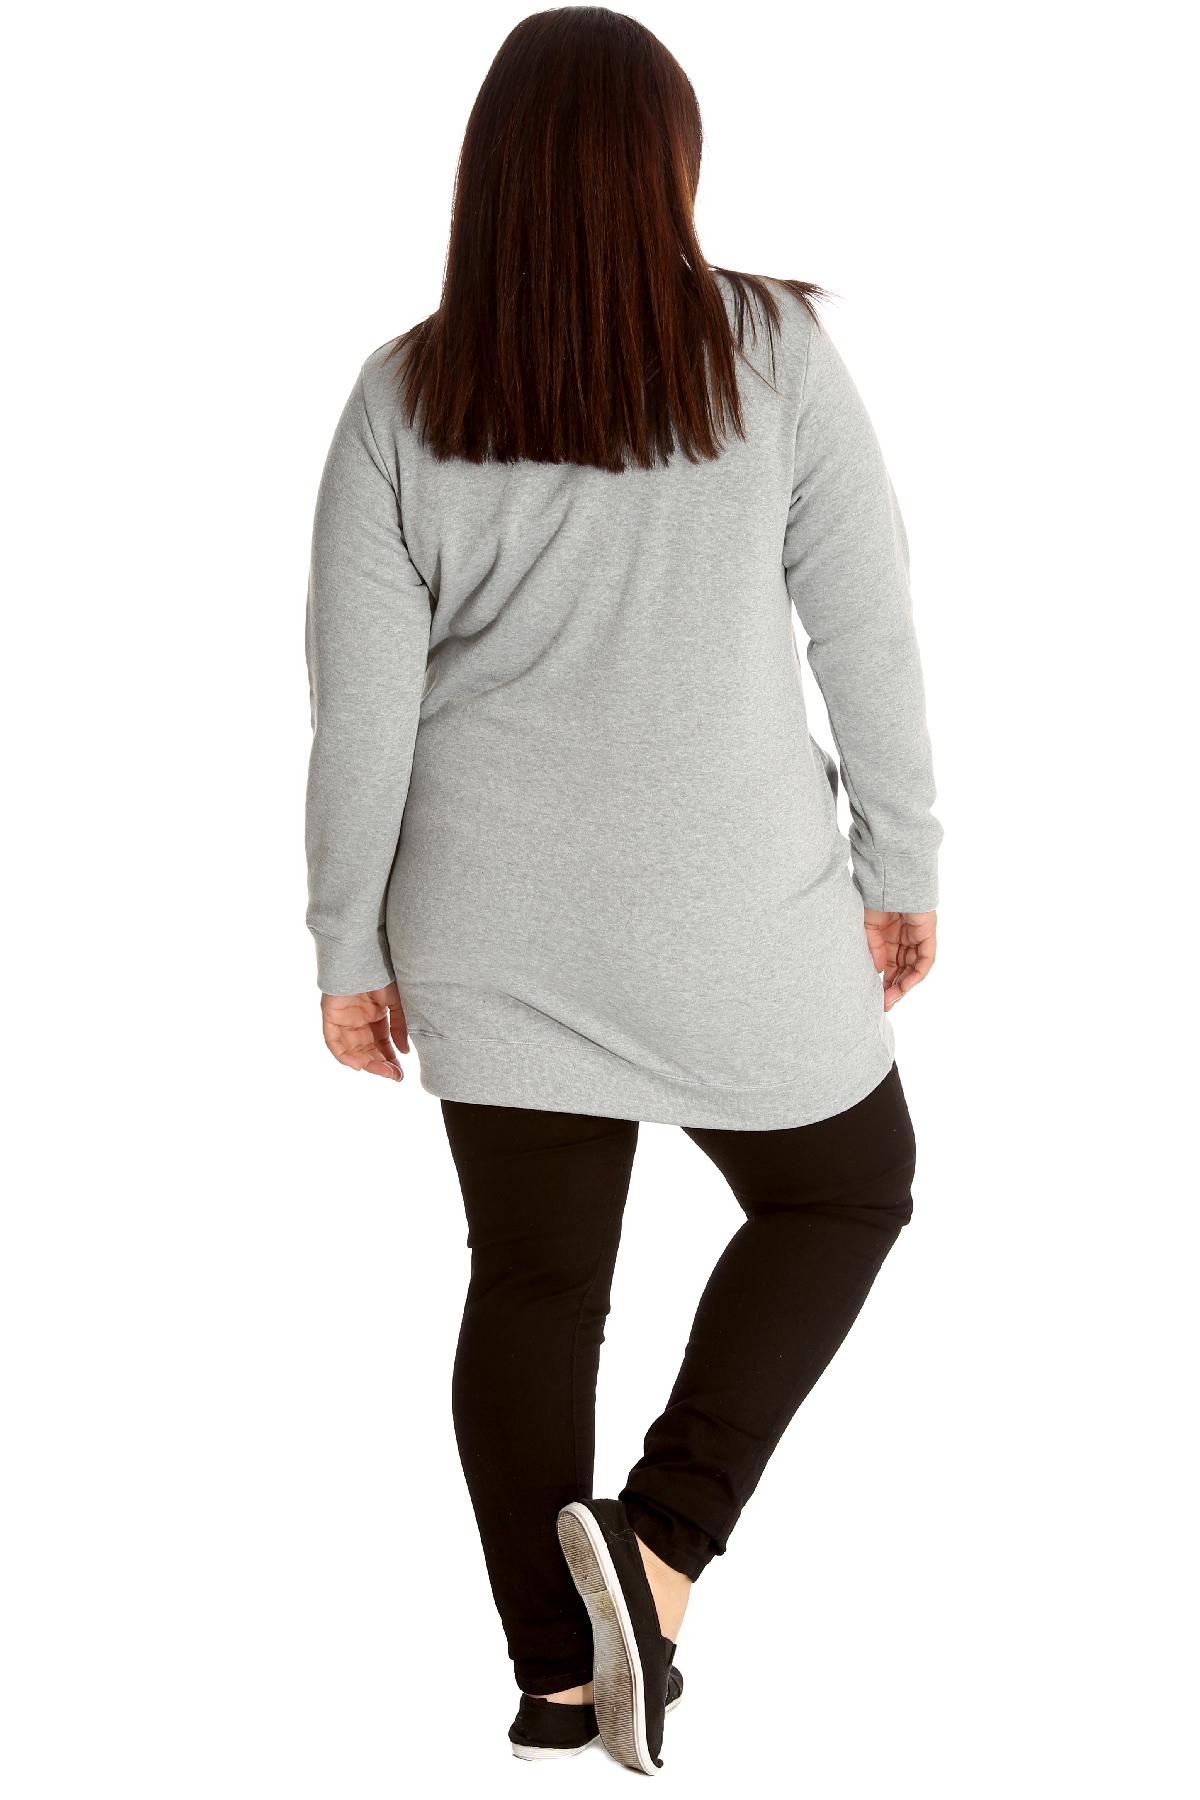 neue frau bergr e sweatshirt damen lang strickjacke stil top seitentasche warm ebay. Black Bedroom Furniture Sets. Home Design Ideas